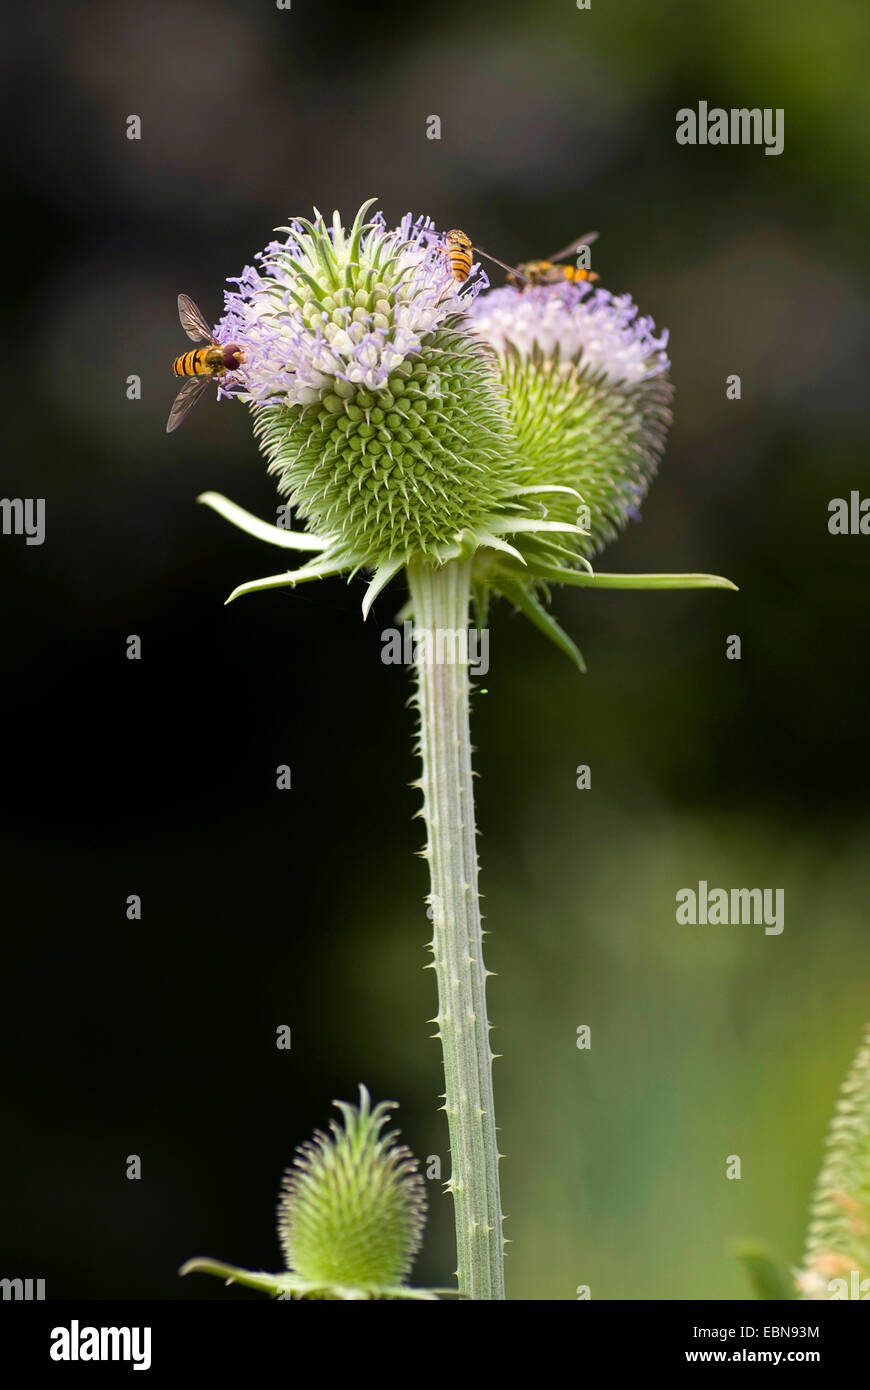 fuller's teasel (Dipsacus sativus), inflorescence - Stock Image